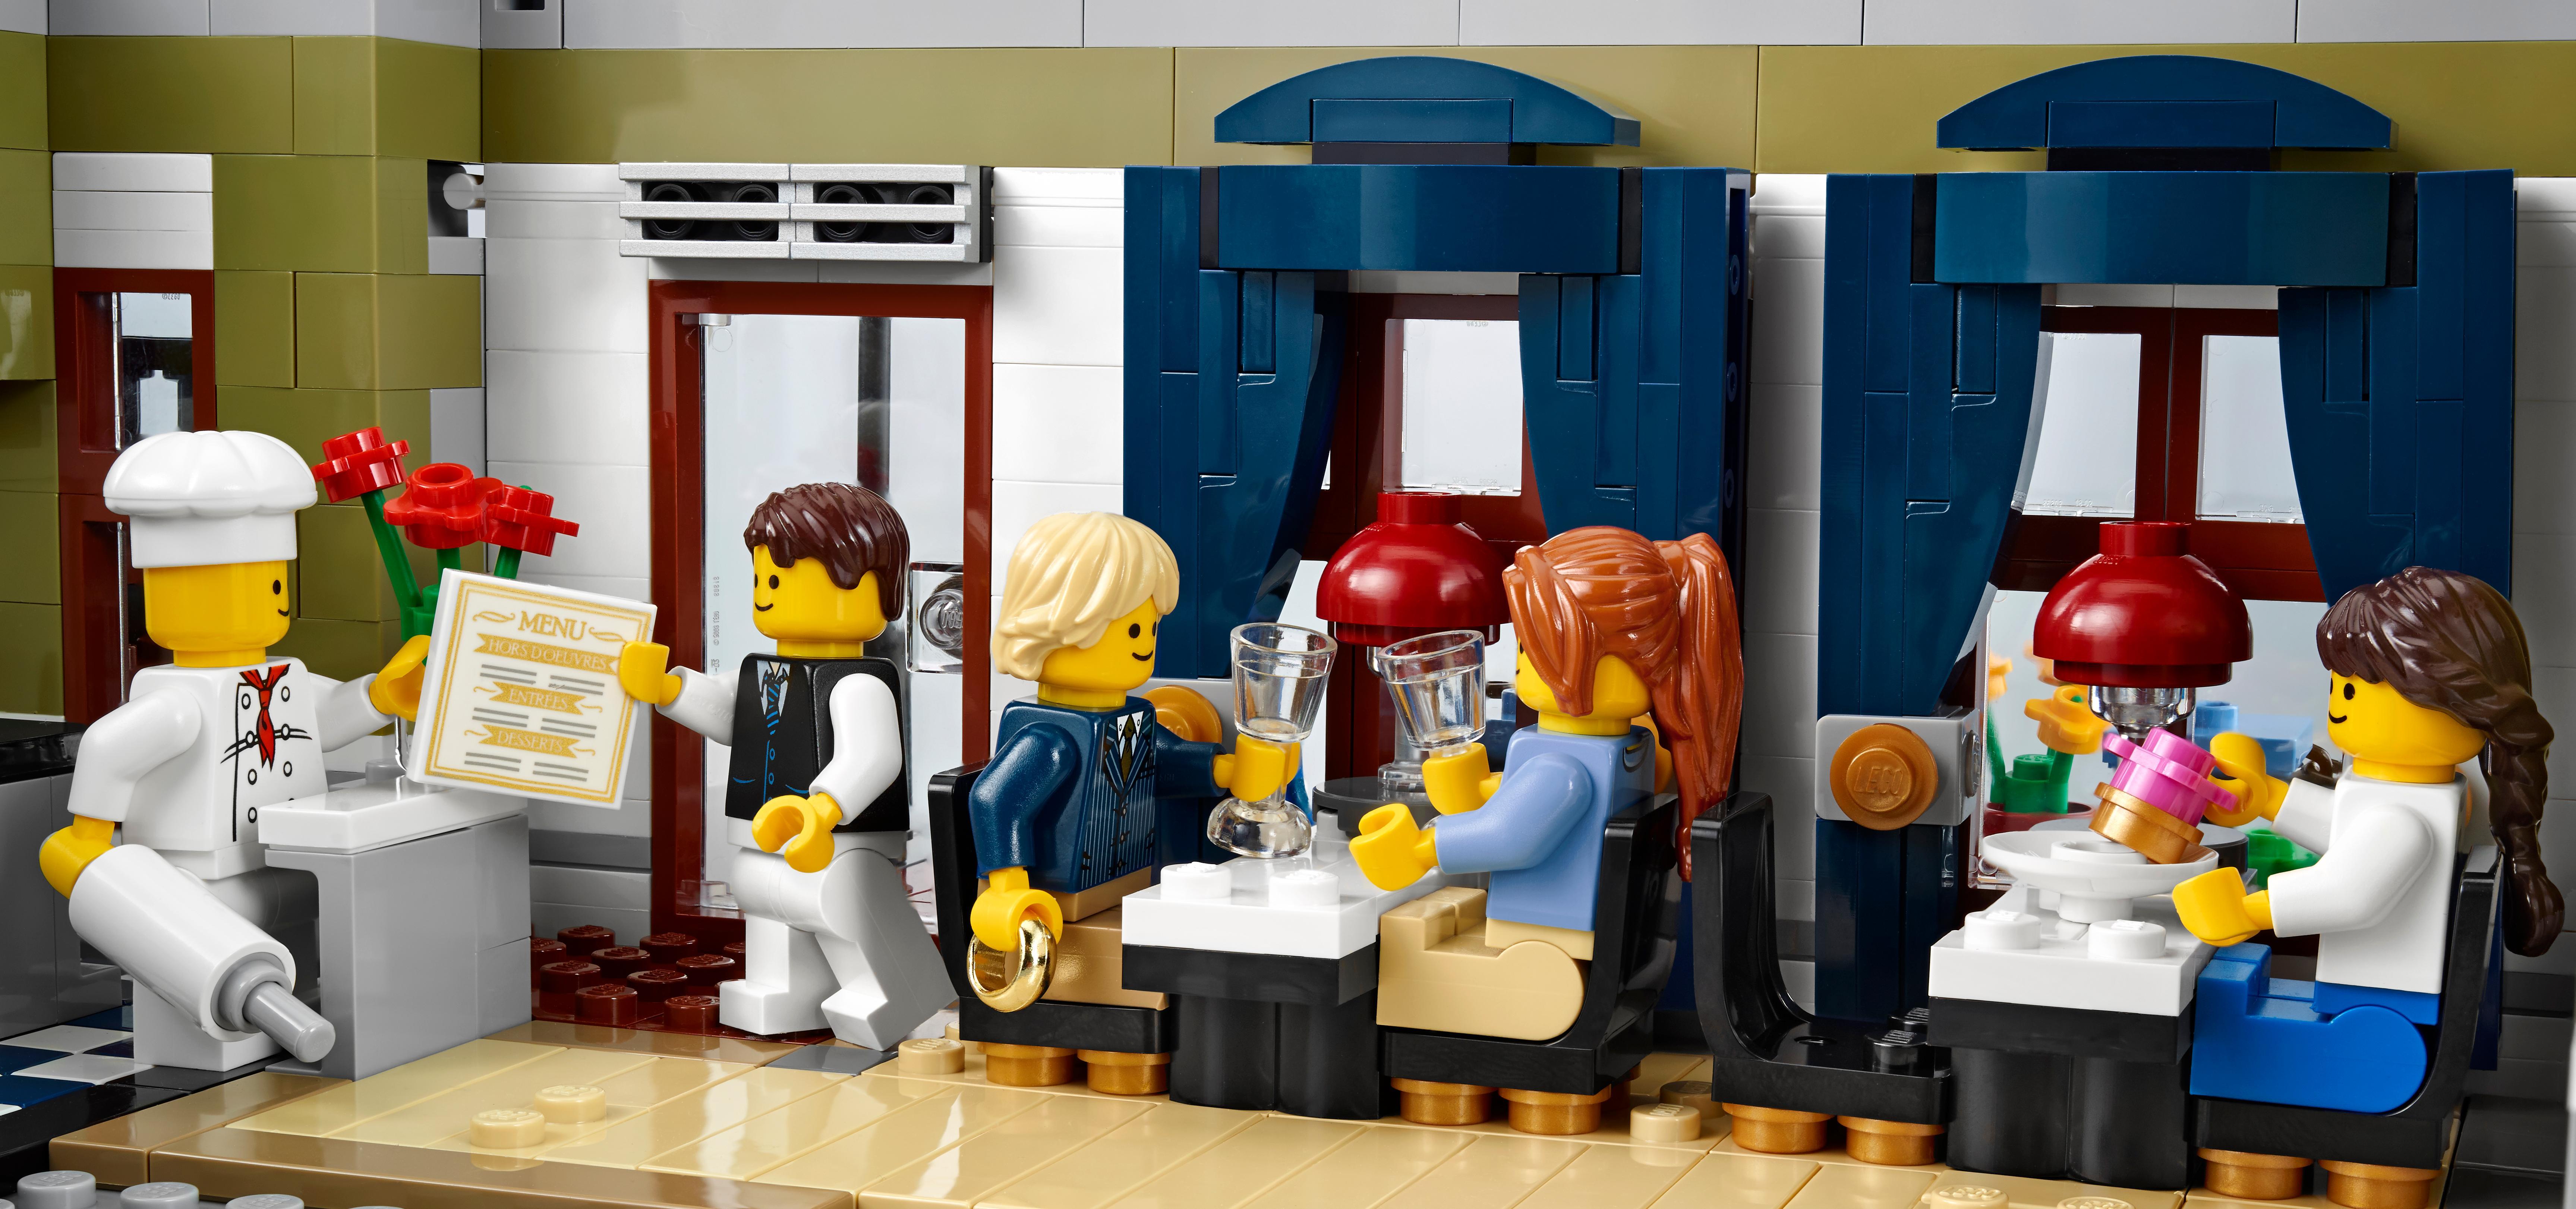 Toys For Restaurants : Amazon lego creator expert parisian restaurant